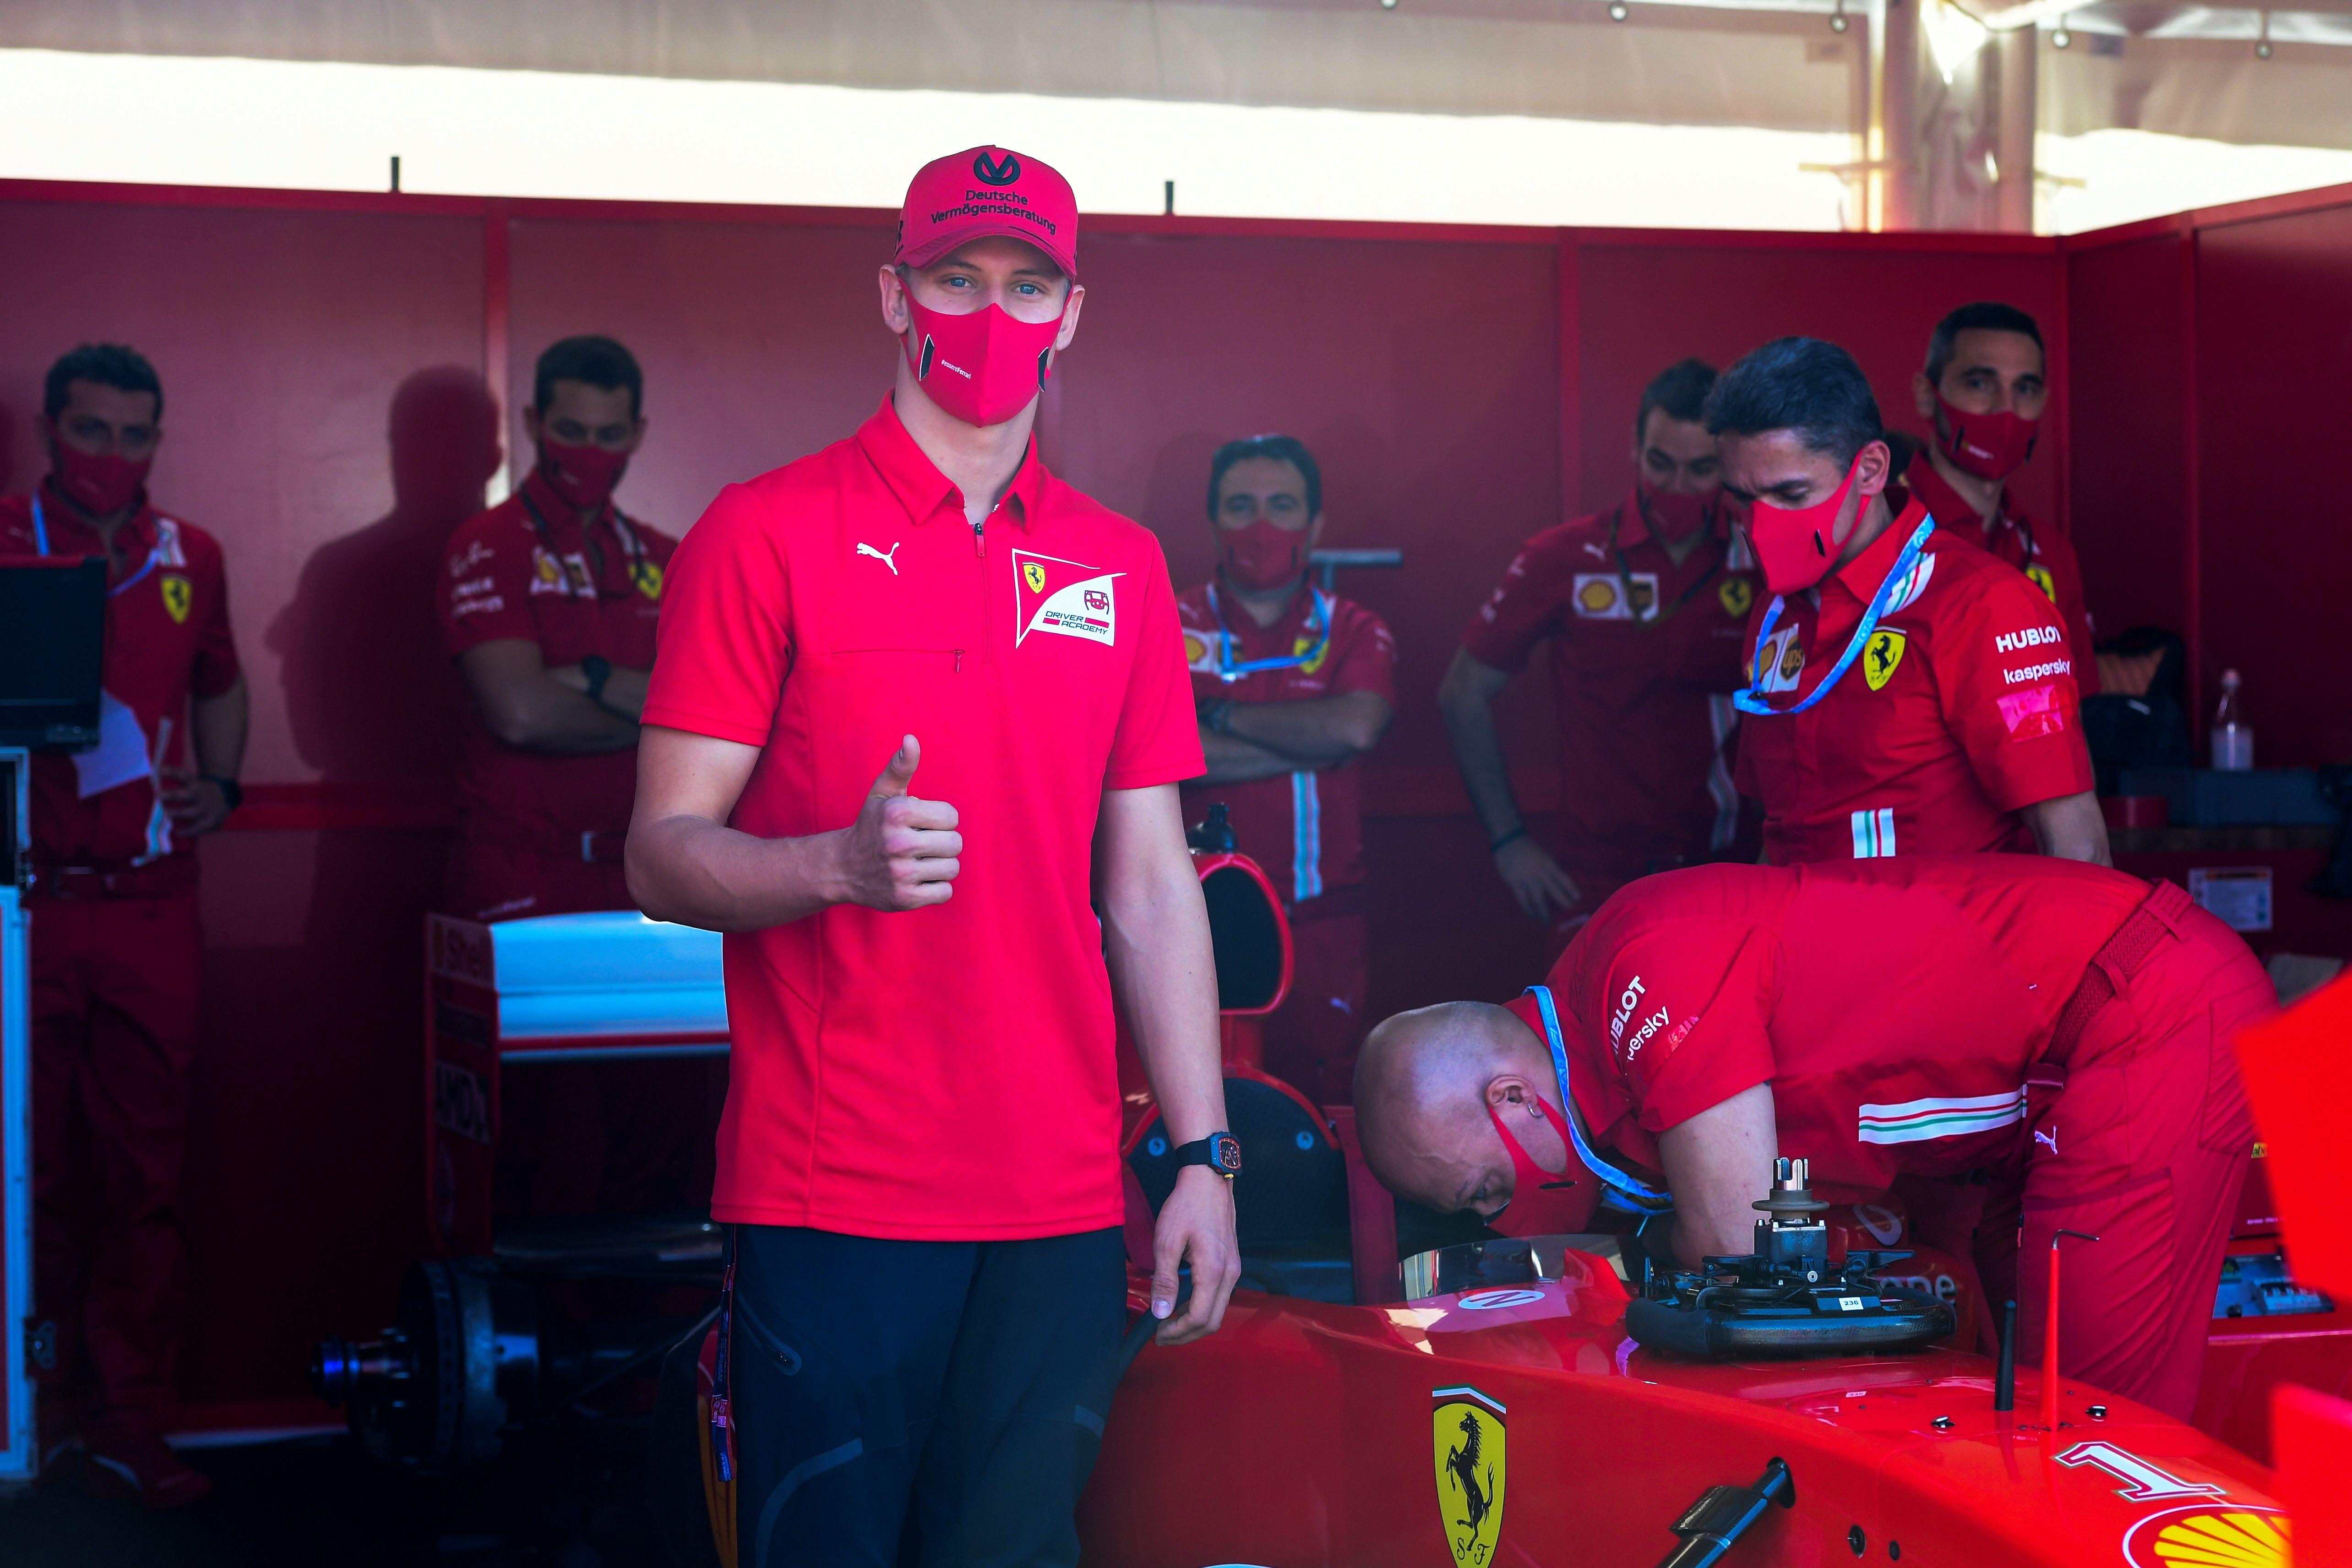 Mick Schumacher, son of former F1 champion Michael Schumacher, visits the Ferrari pit in 2020